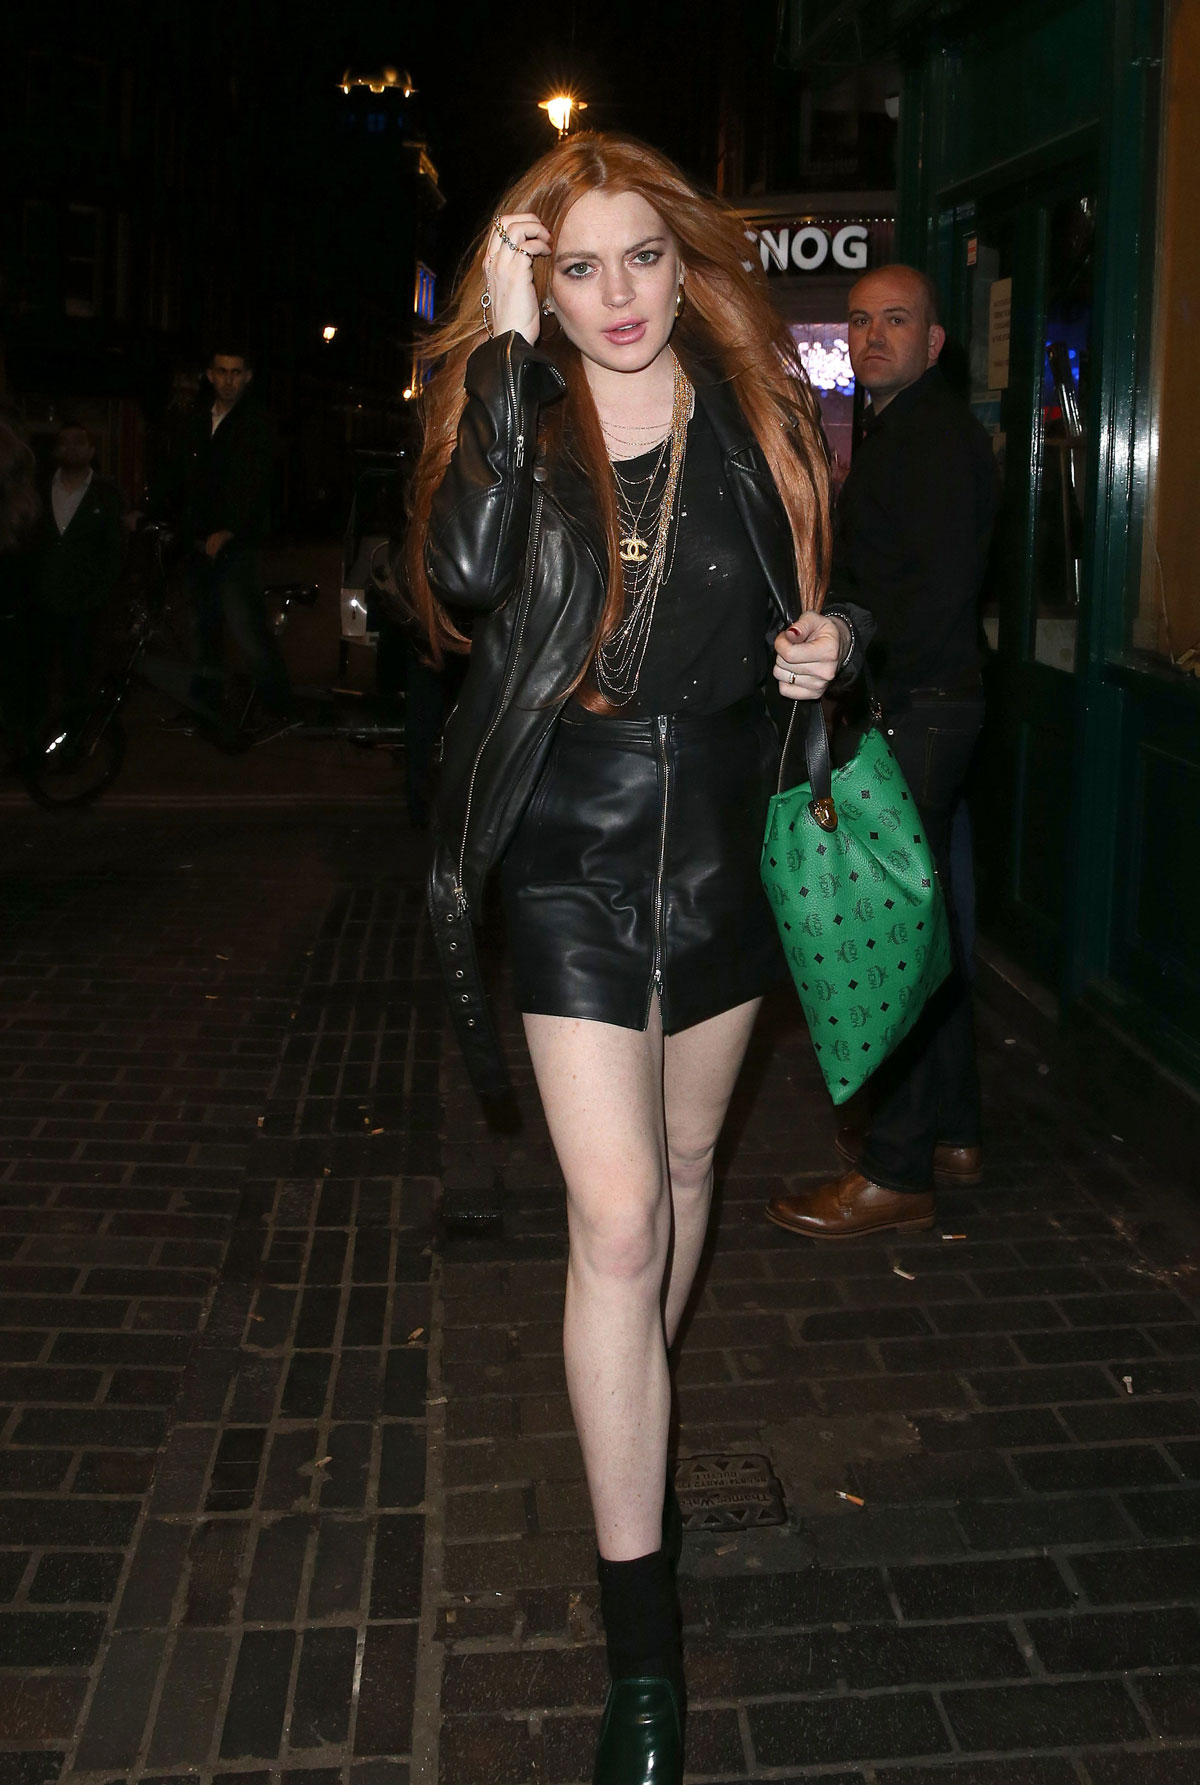 Lindsay Lohan leaving the Firehouse Club